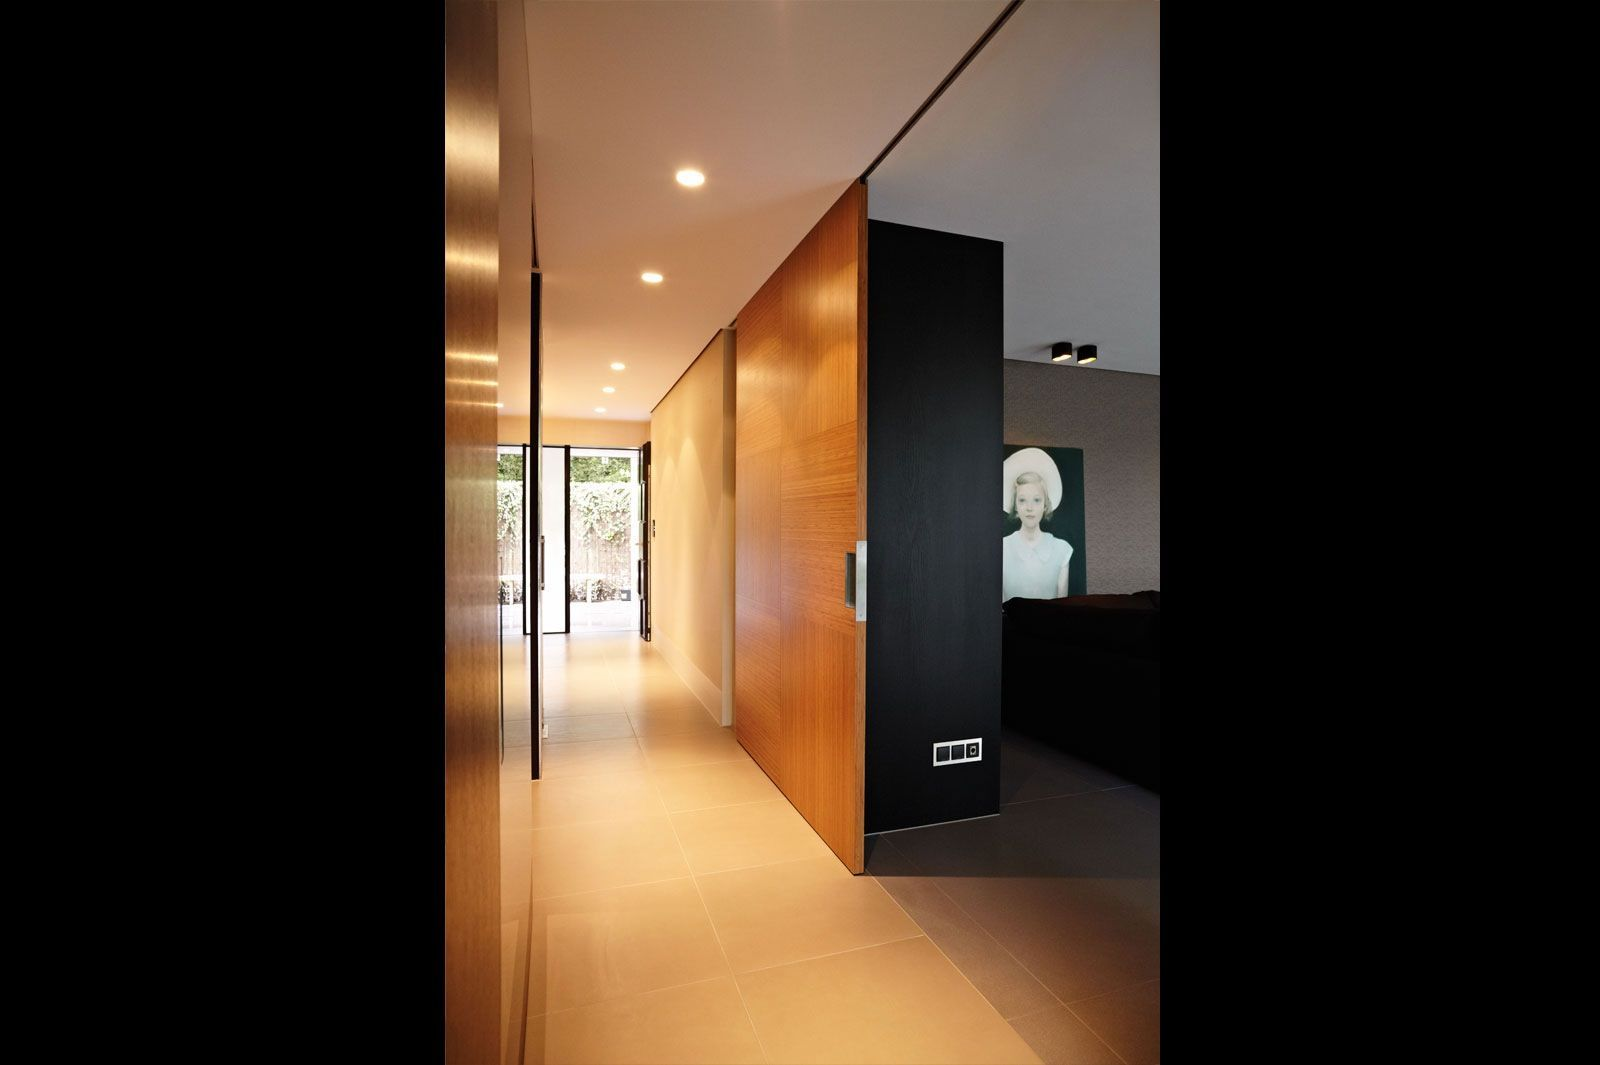 Bamboo sliding door, interior design by Osiris Hertman Studio #osirishertmaninteriors Bamboo sliding door, interior design by Osiris Hertman Studio